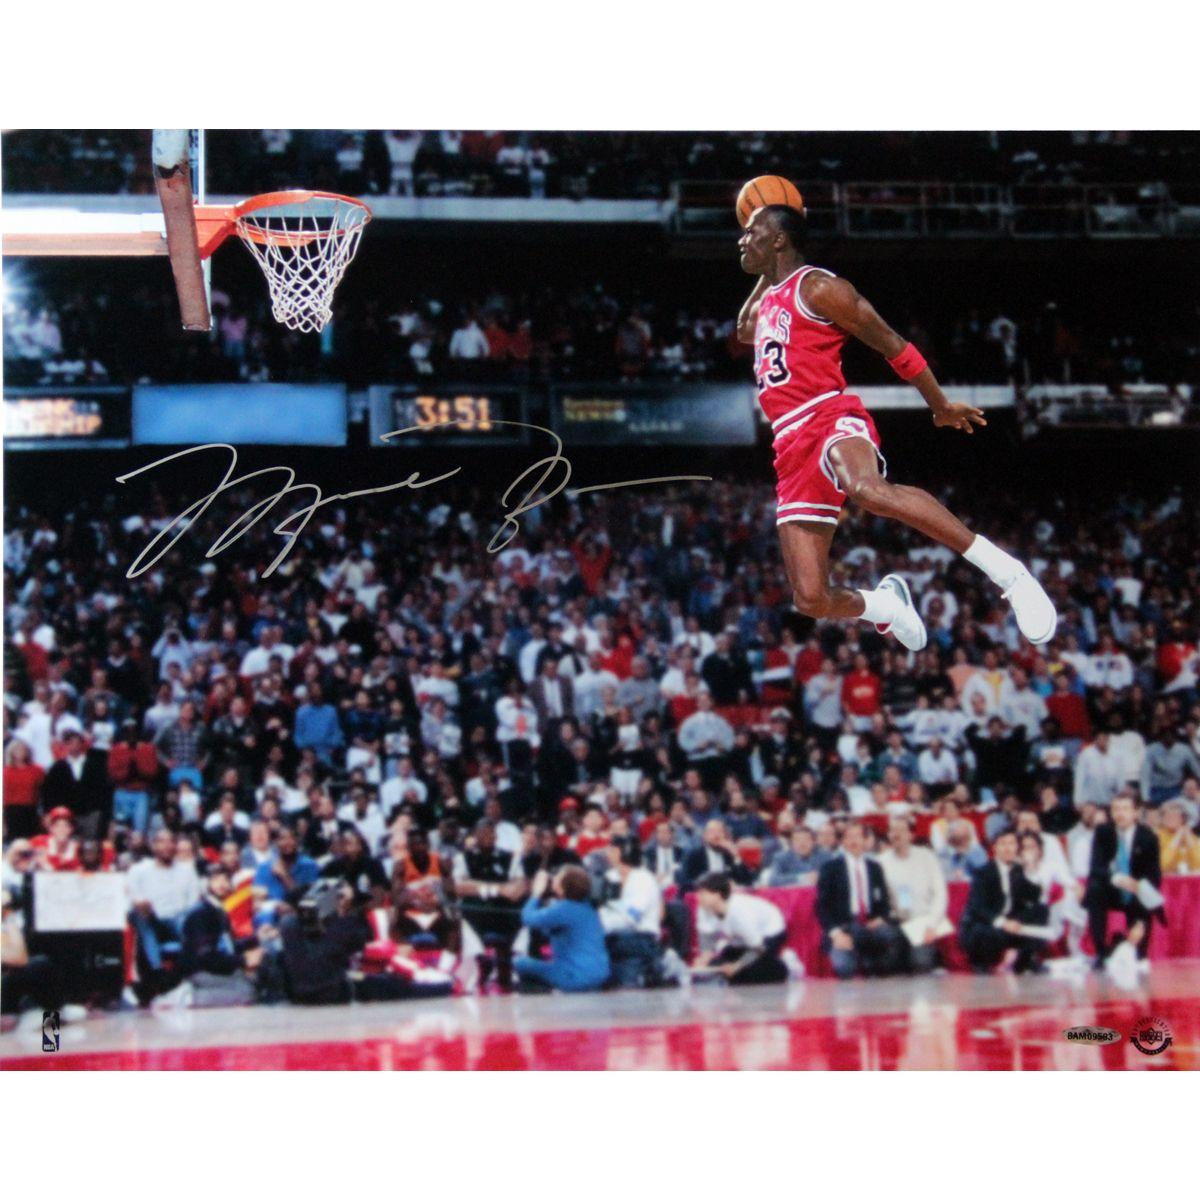 Pin by Connor on Sport | Michael jordan basketball